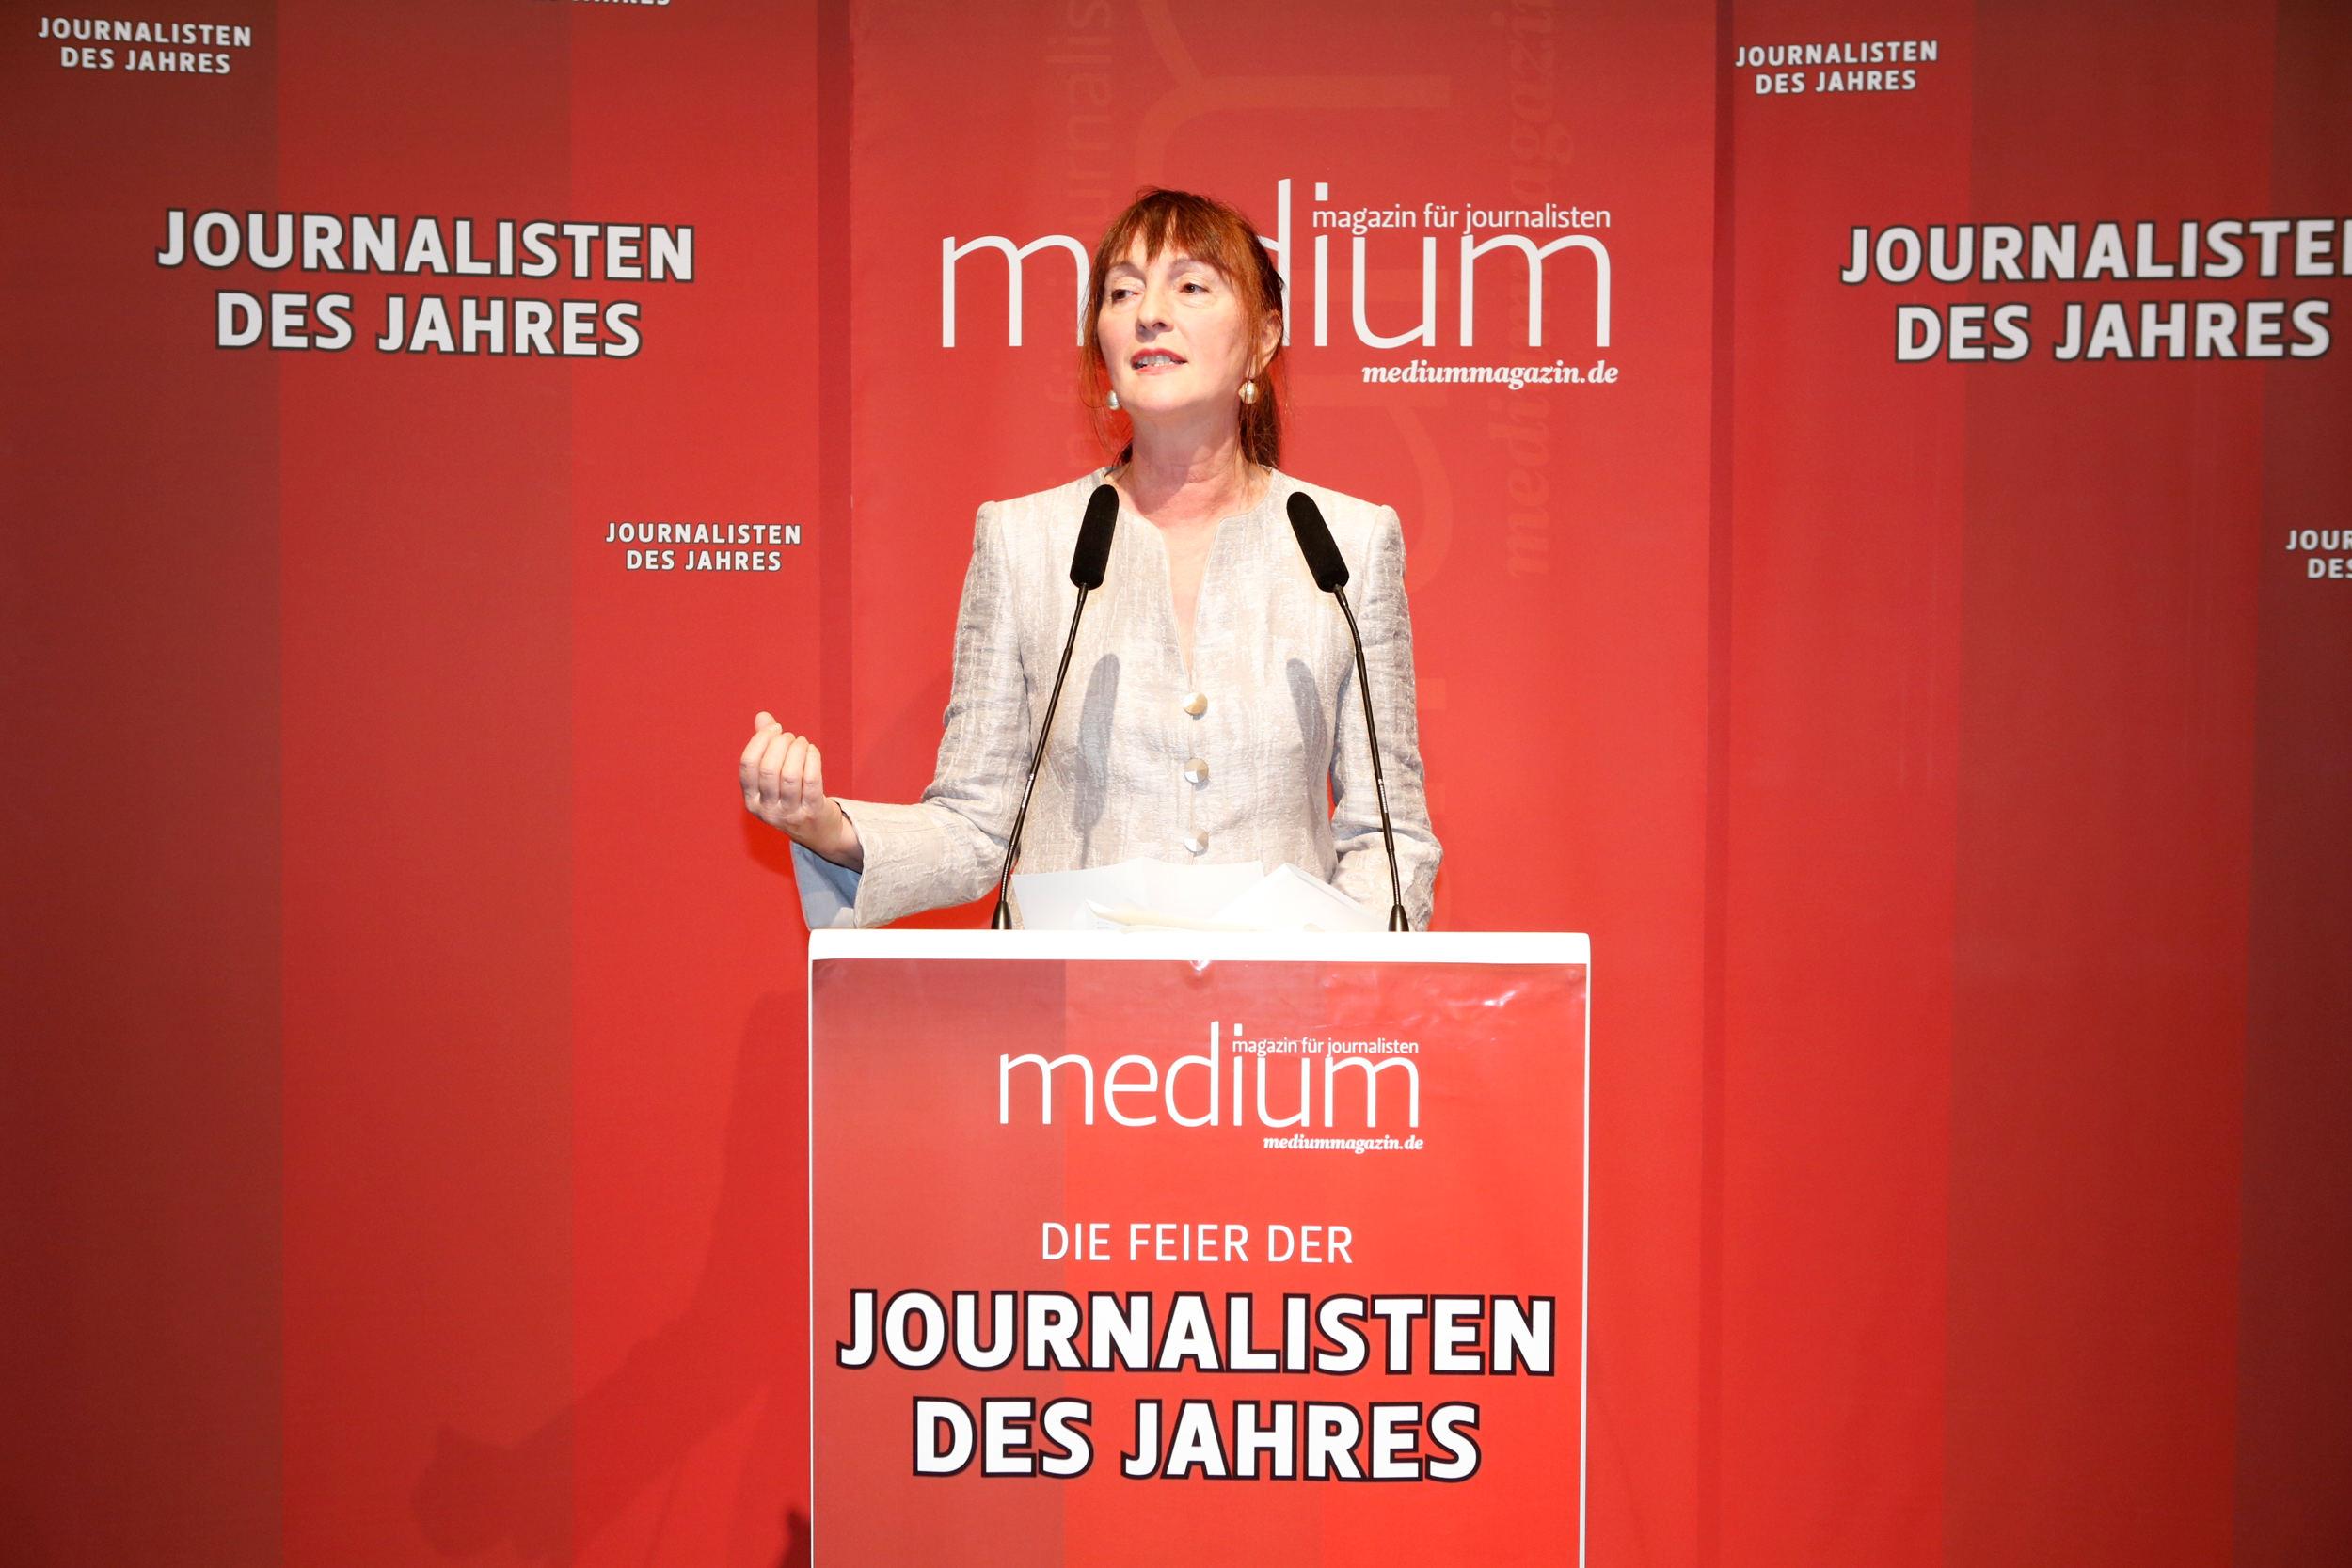 chefredakteur joachim braun